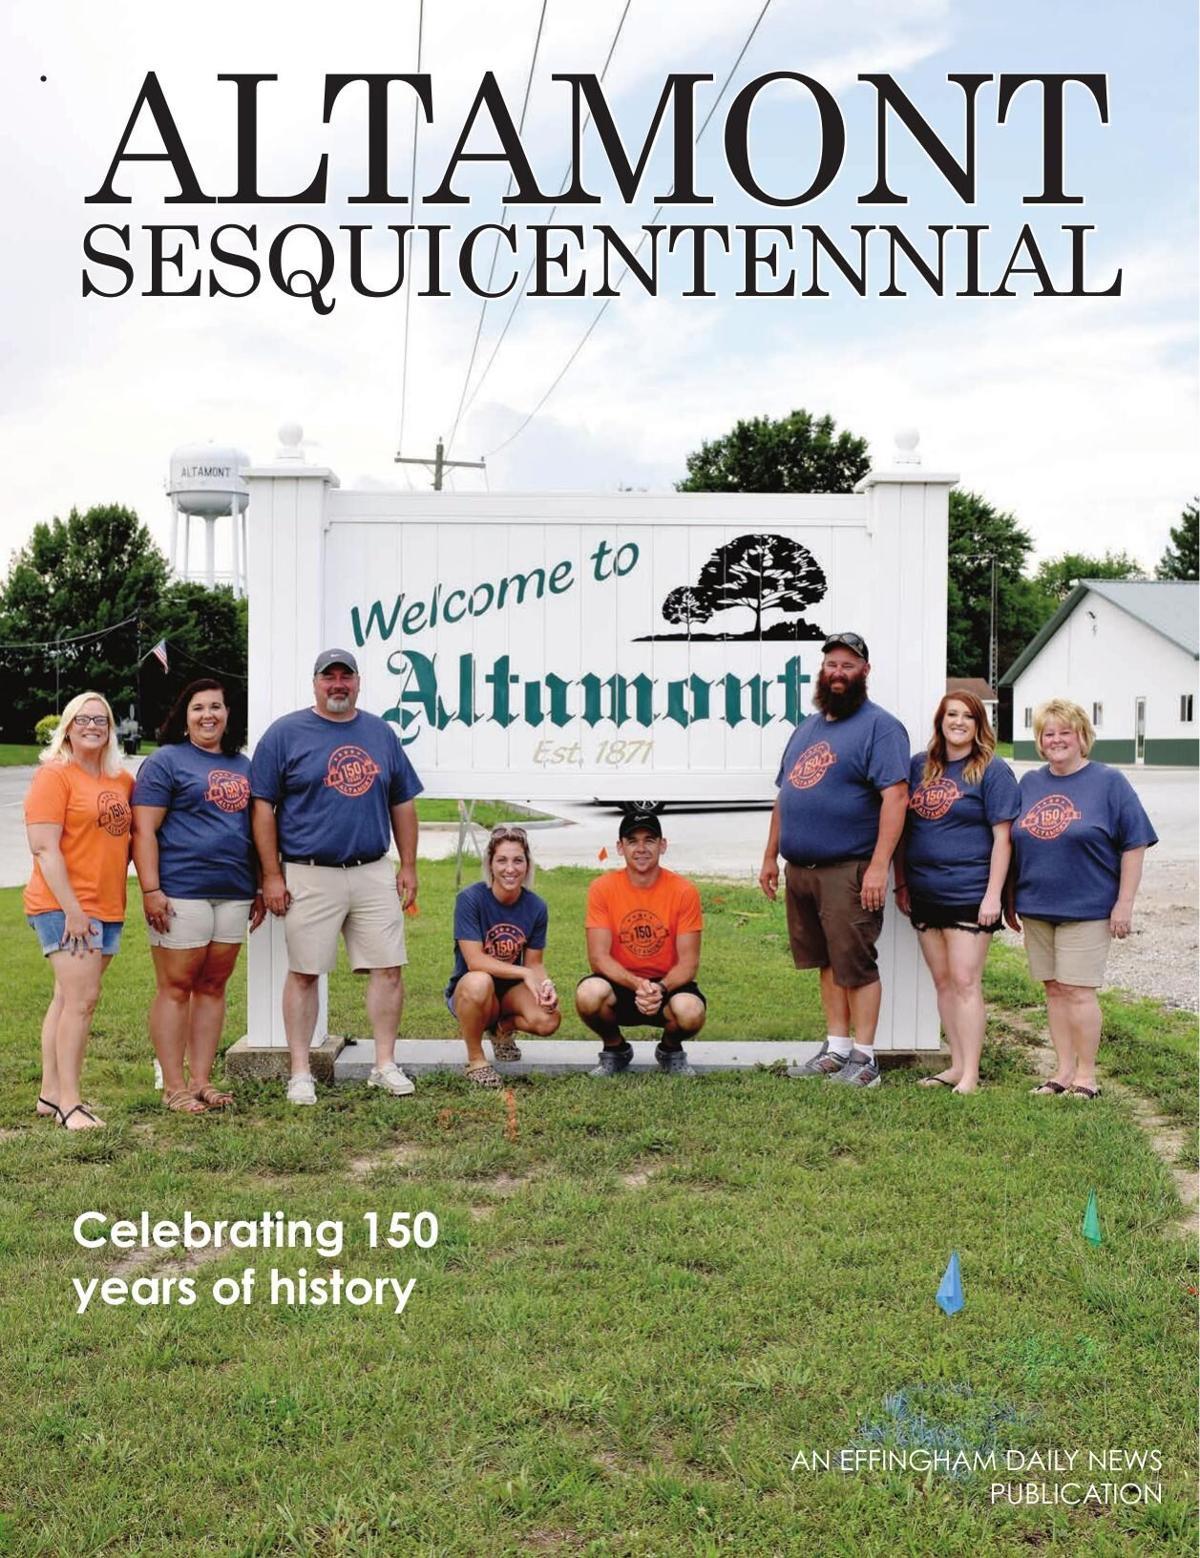 Altamont Sesquicentennial